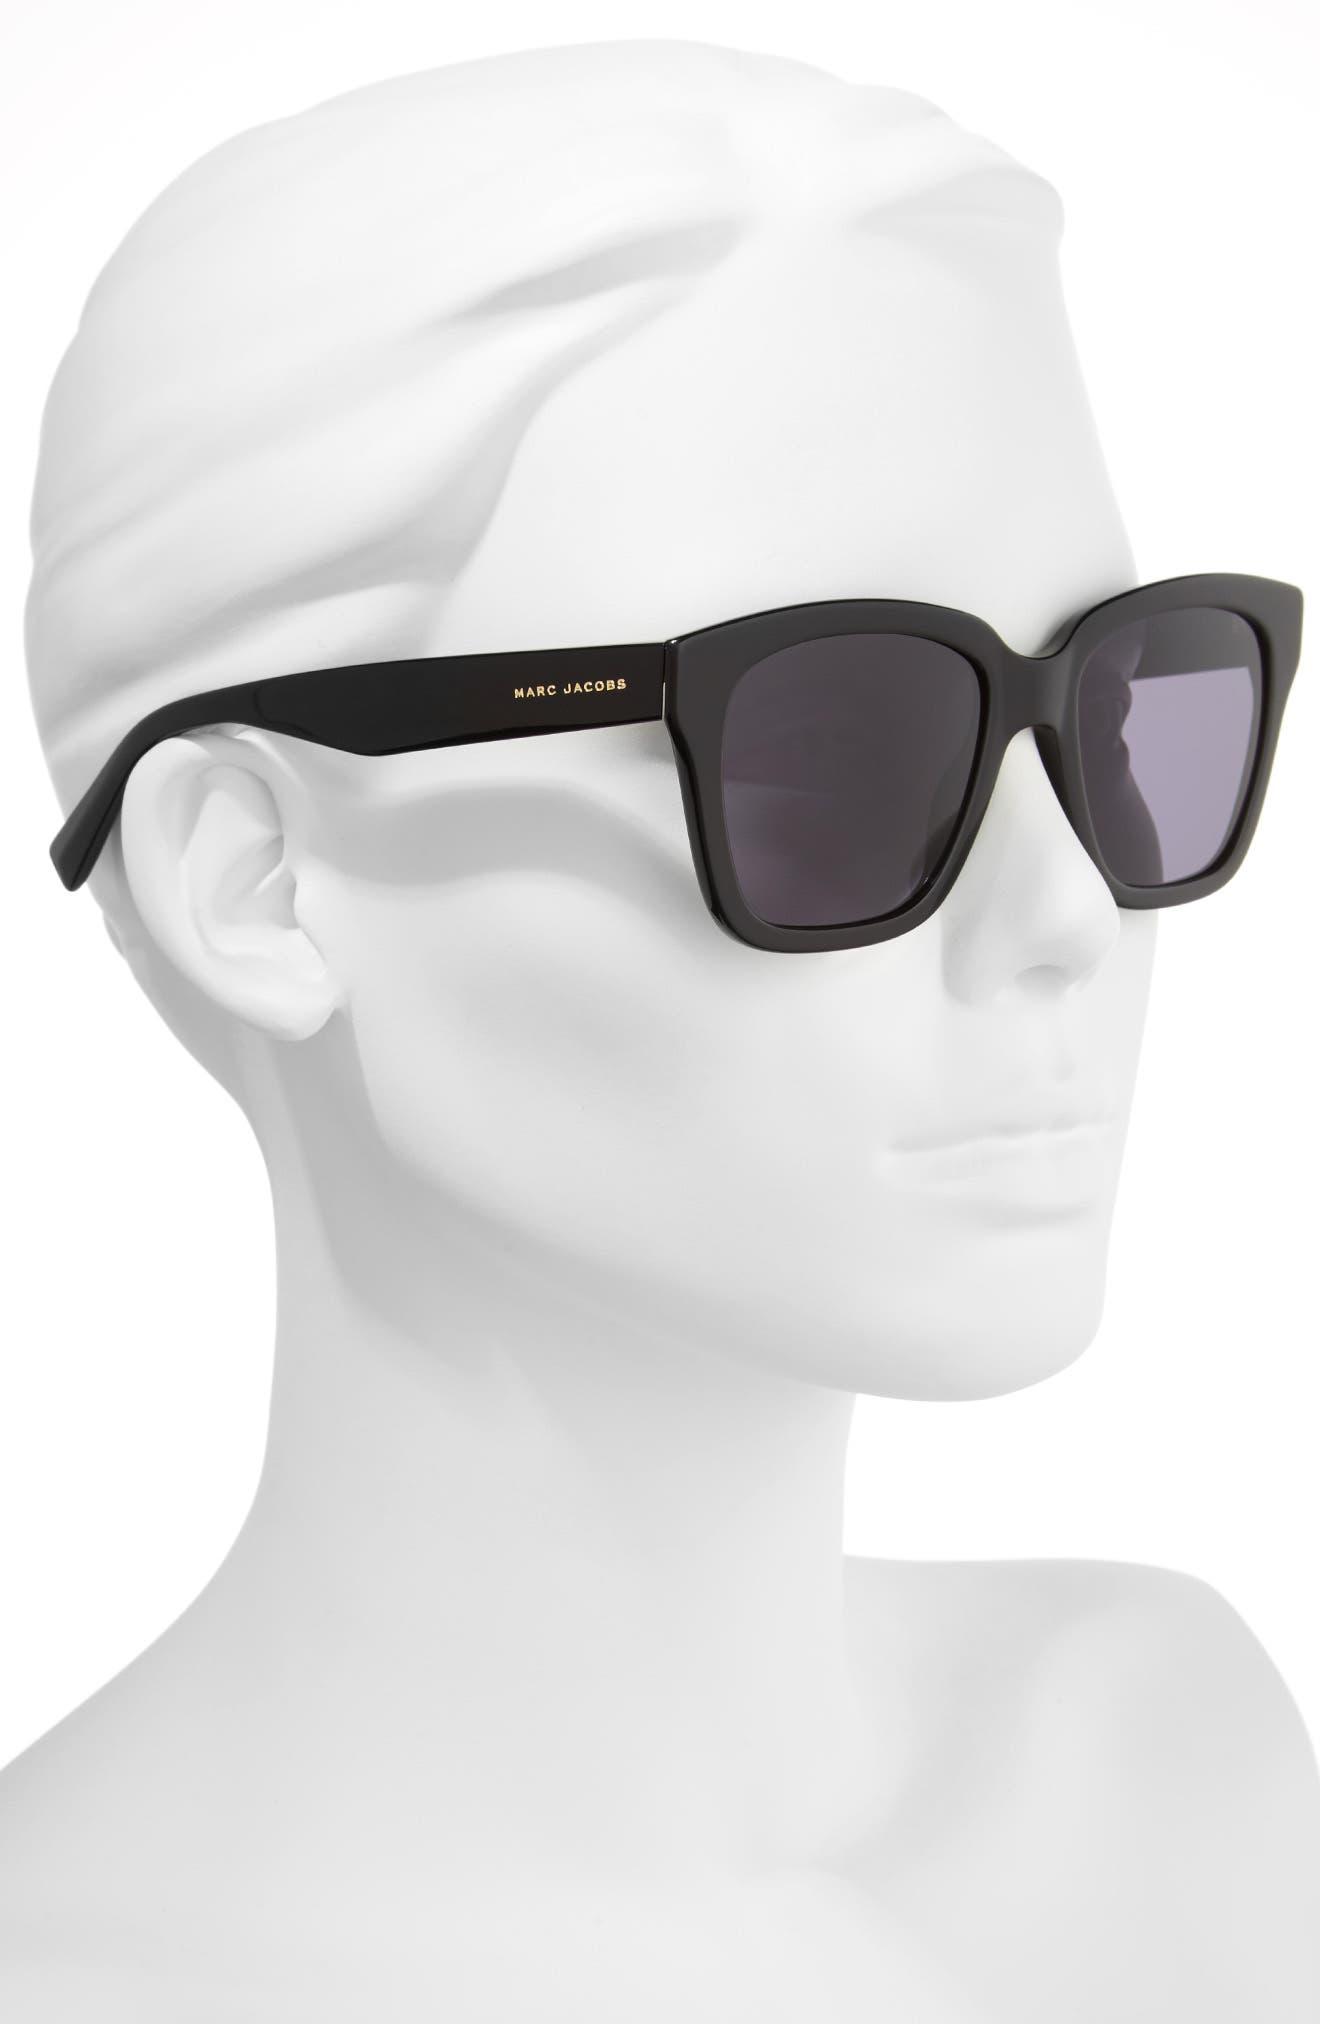 52mm Square Sunglasses,                             Alternate thumbnail 2, color,                             Black Glitter/ Gray Blue